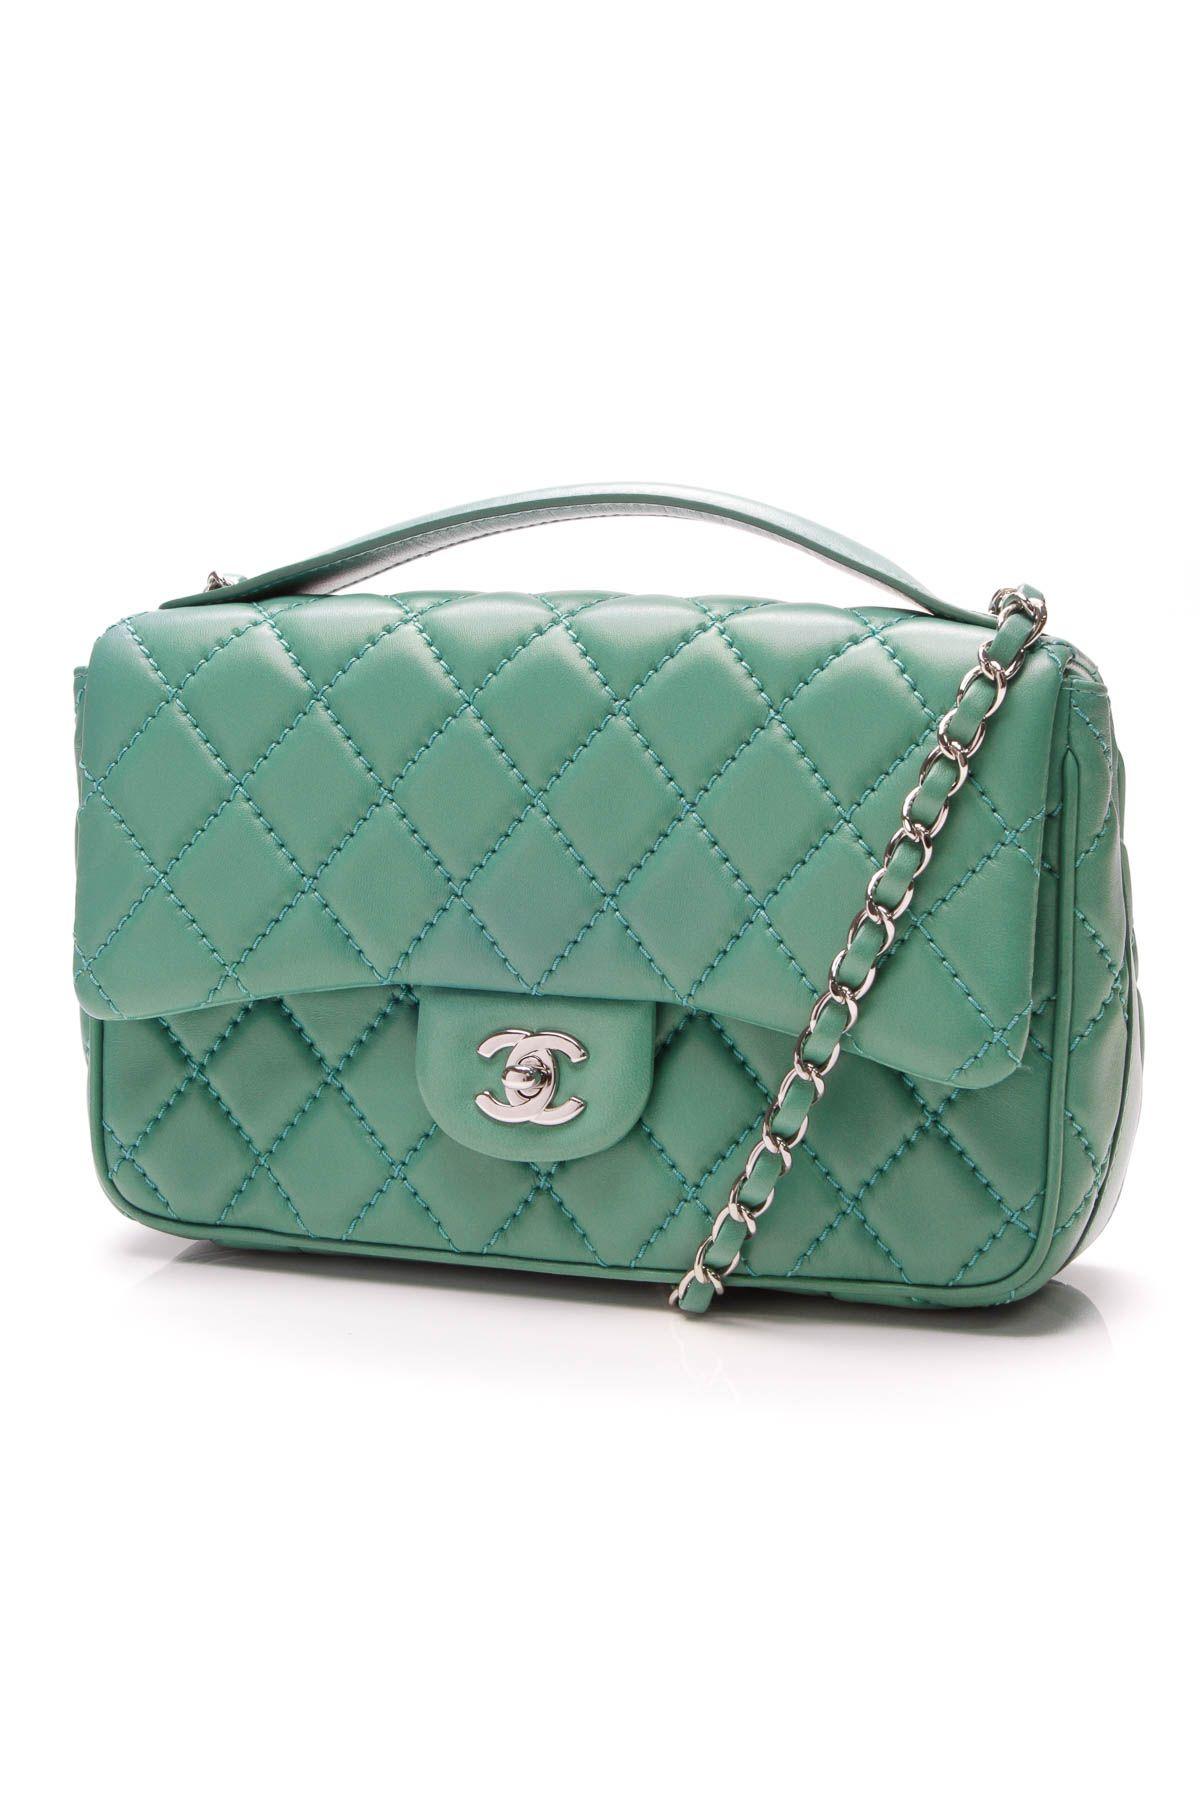 90ab9ae9eb74 Chanel Easy Carry Medium Flap Bag - Green Lambskin | On The Bright ...